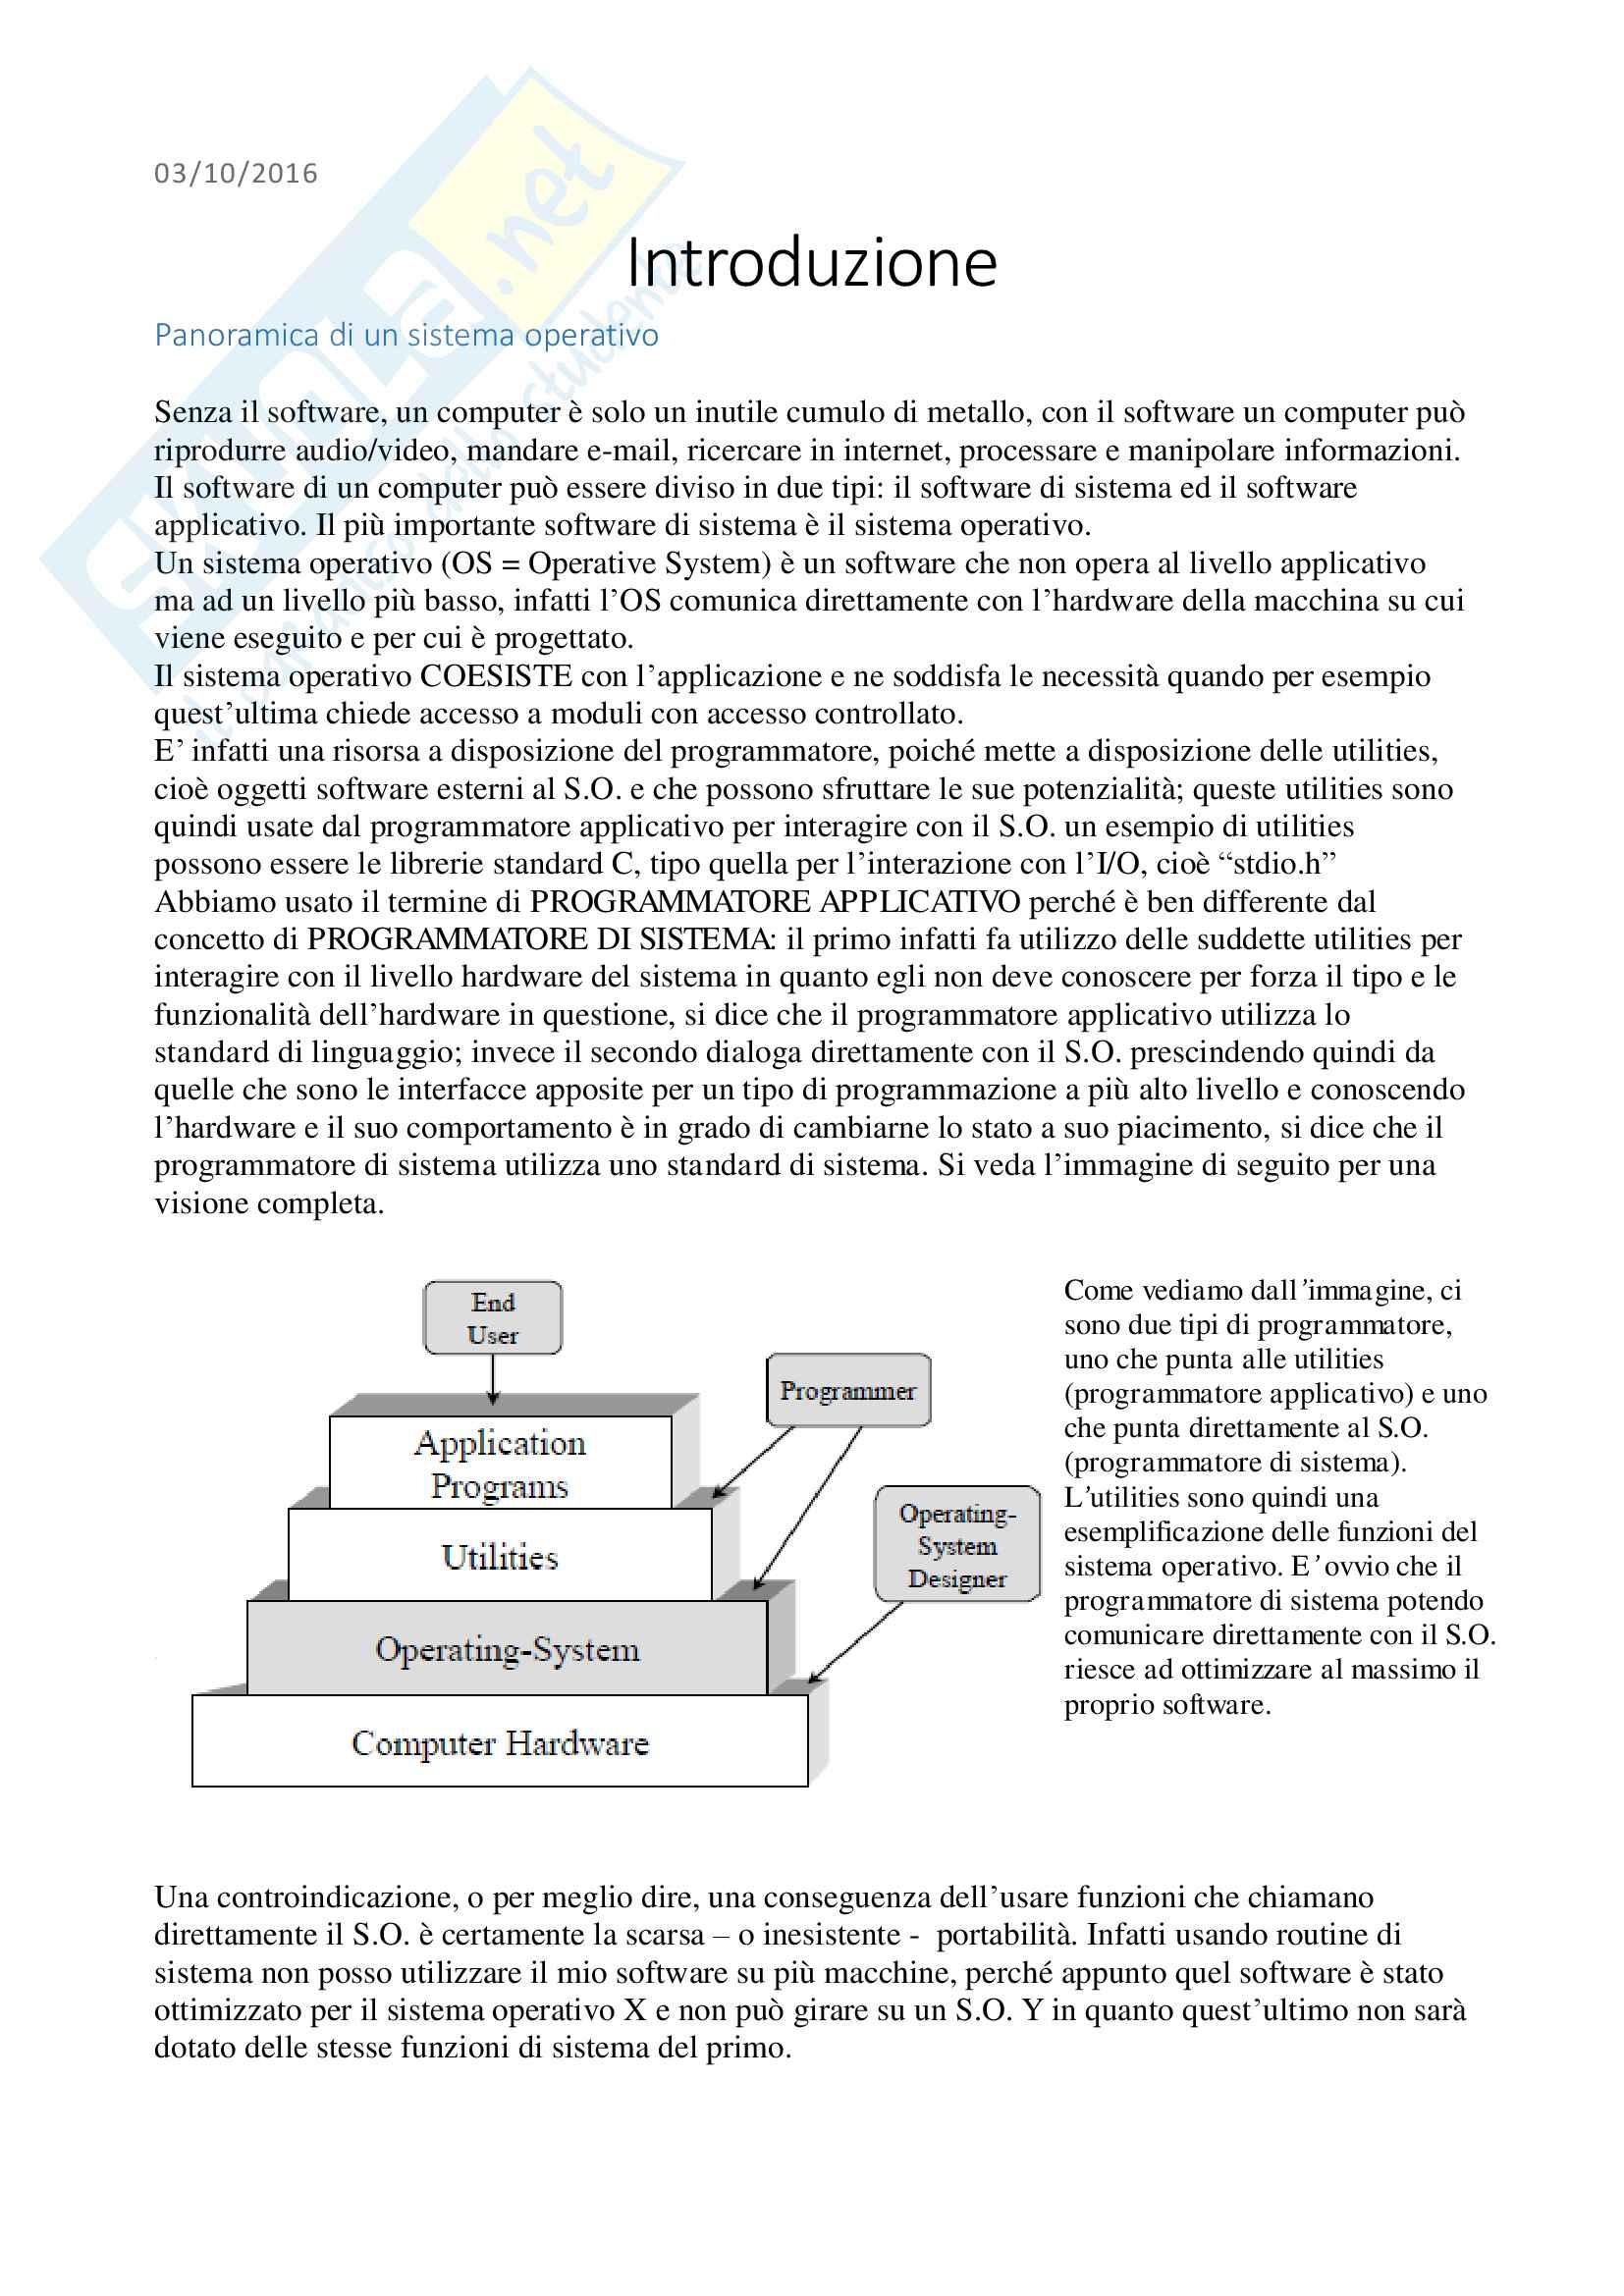 Sistemi Operativi - Appunti